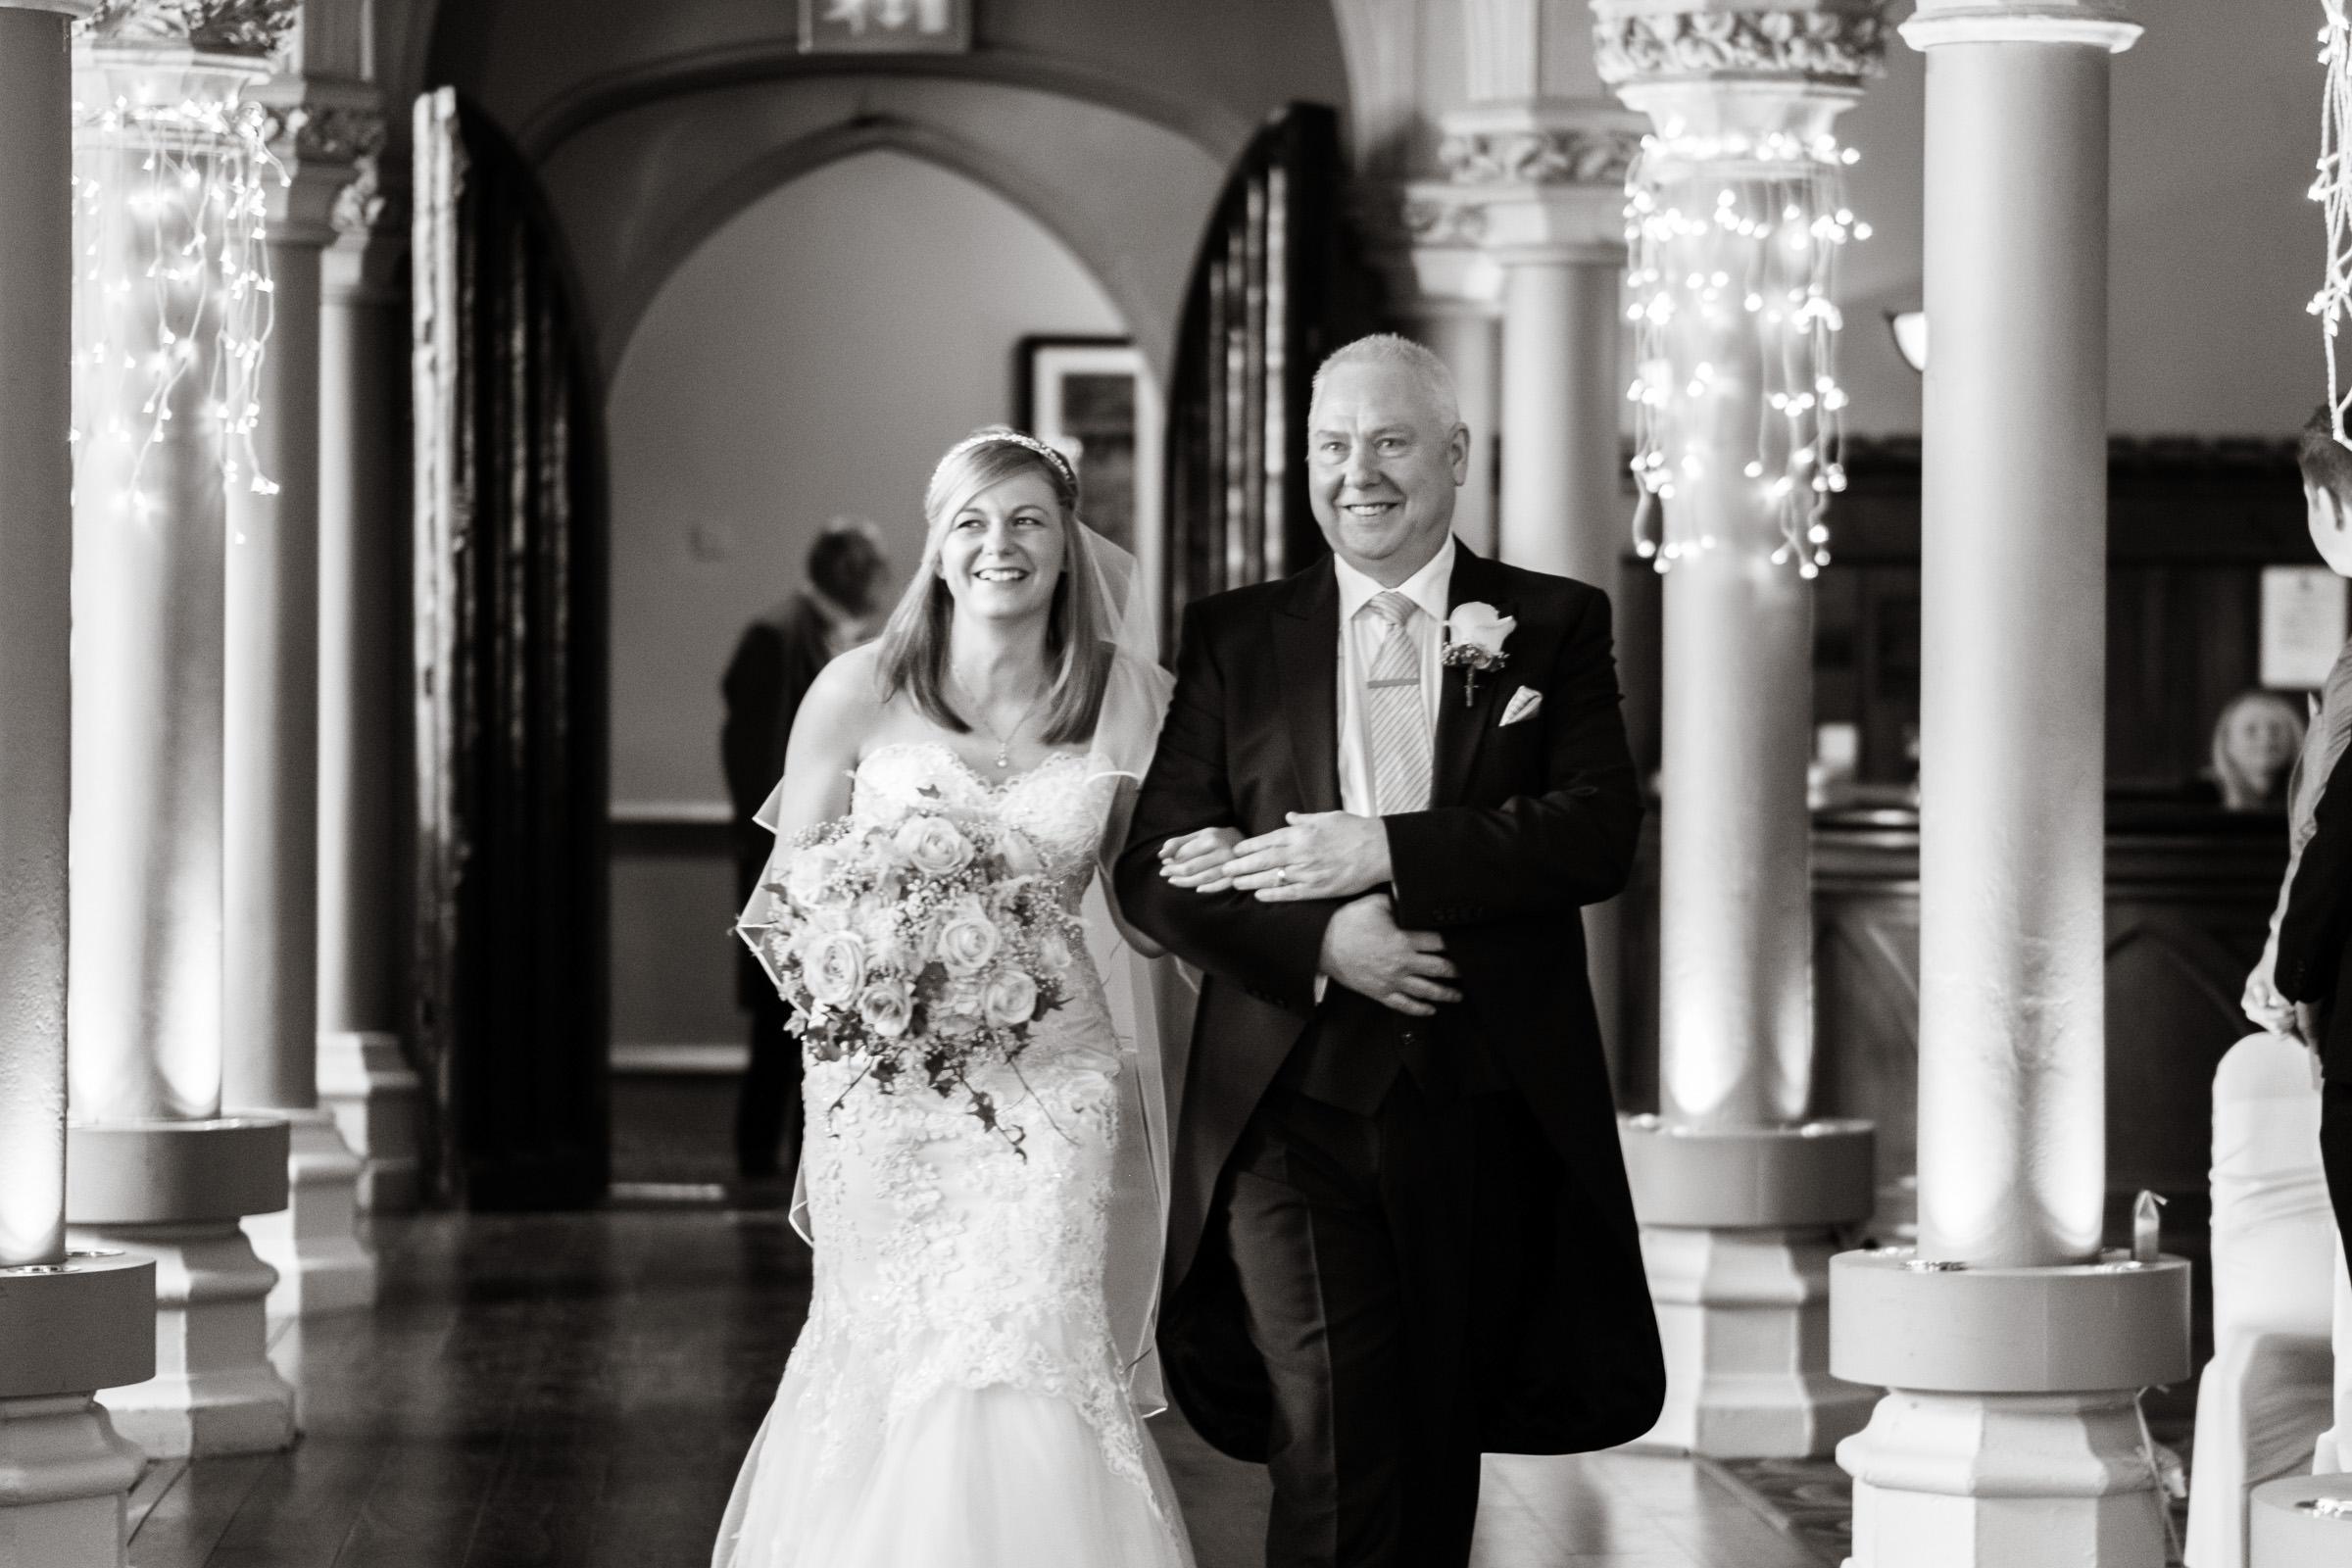 Donna & Nick's Wedding at Wotton House in Dorking 008.jpg